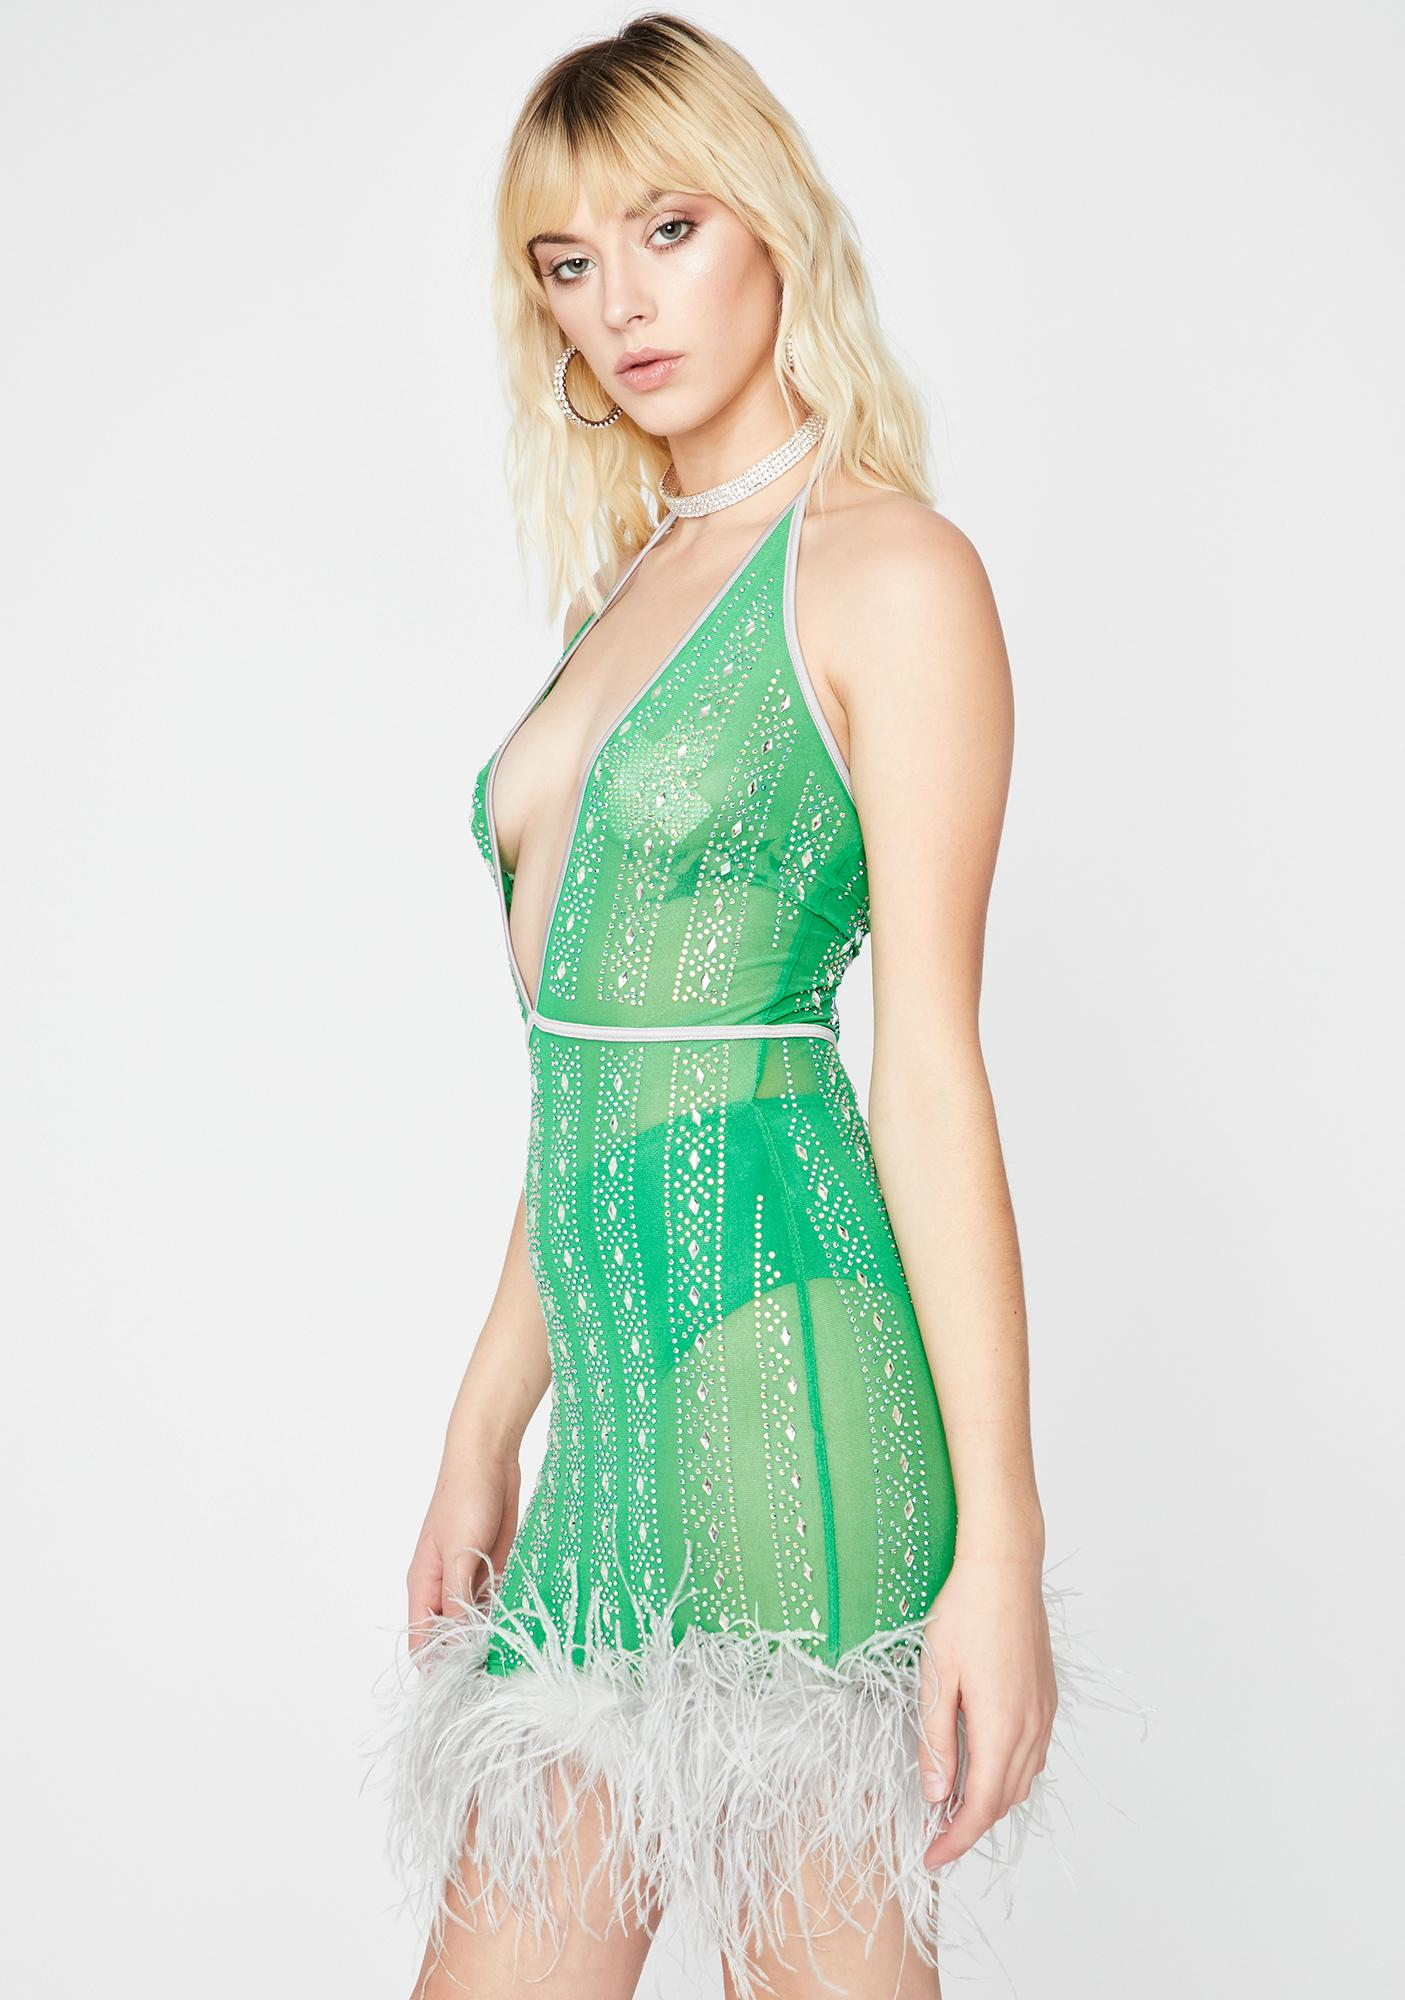 Envy Sweet Surrender Rhinestone Dress